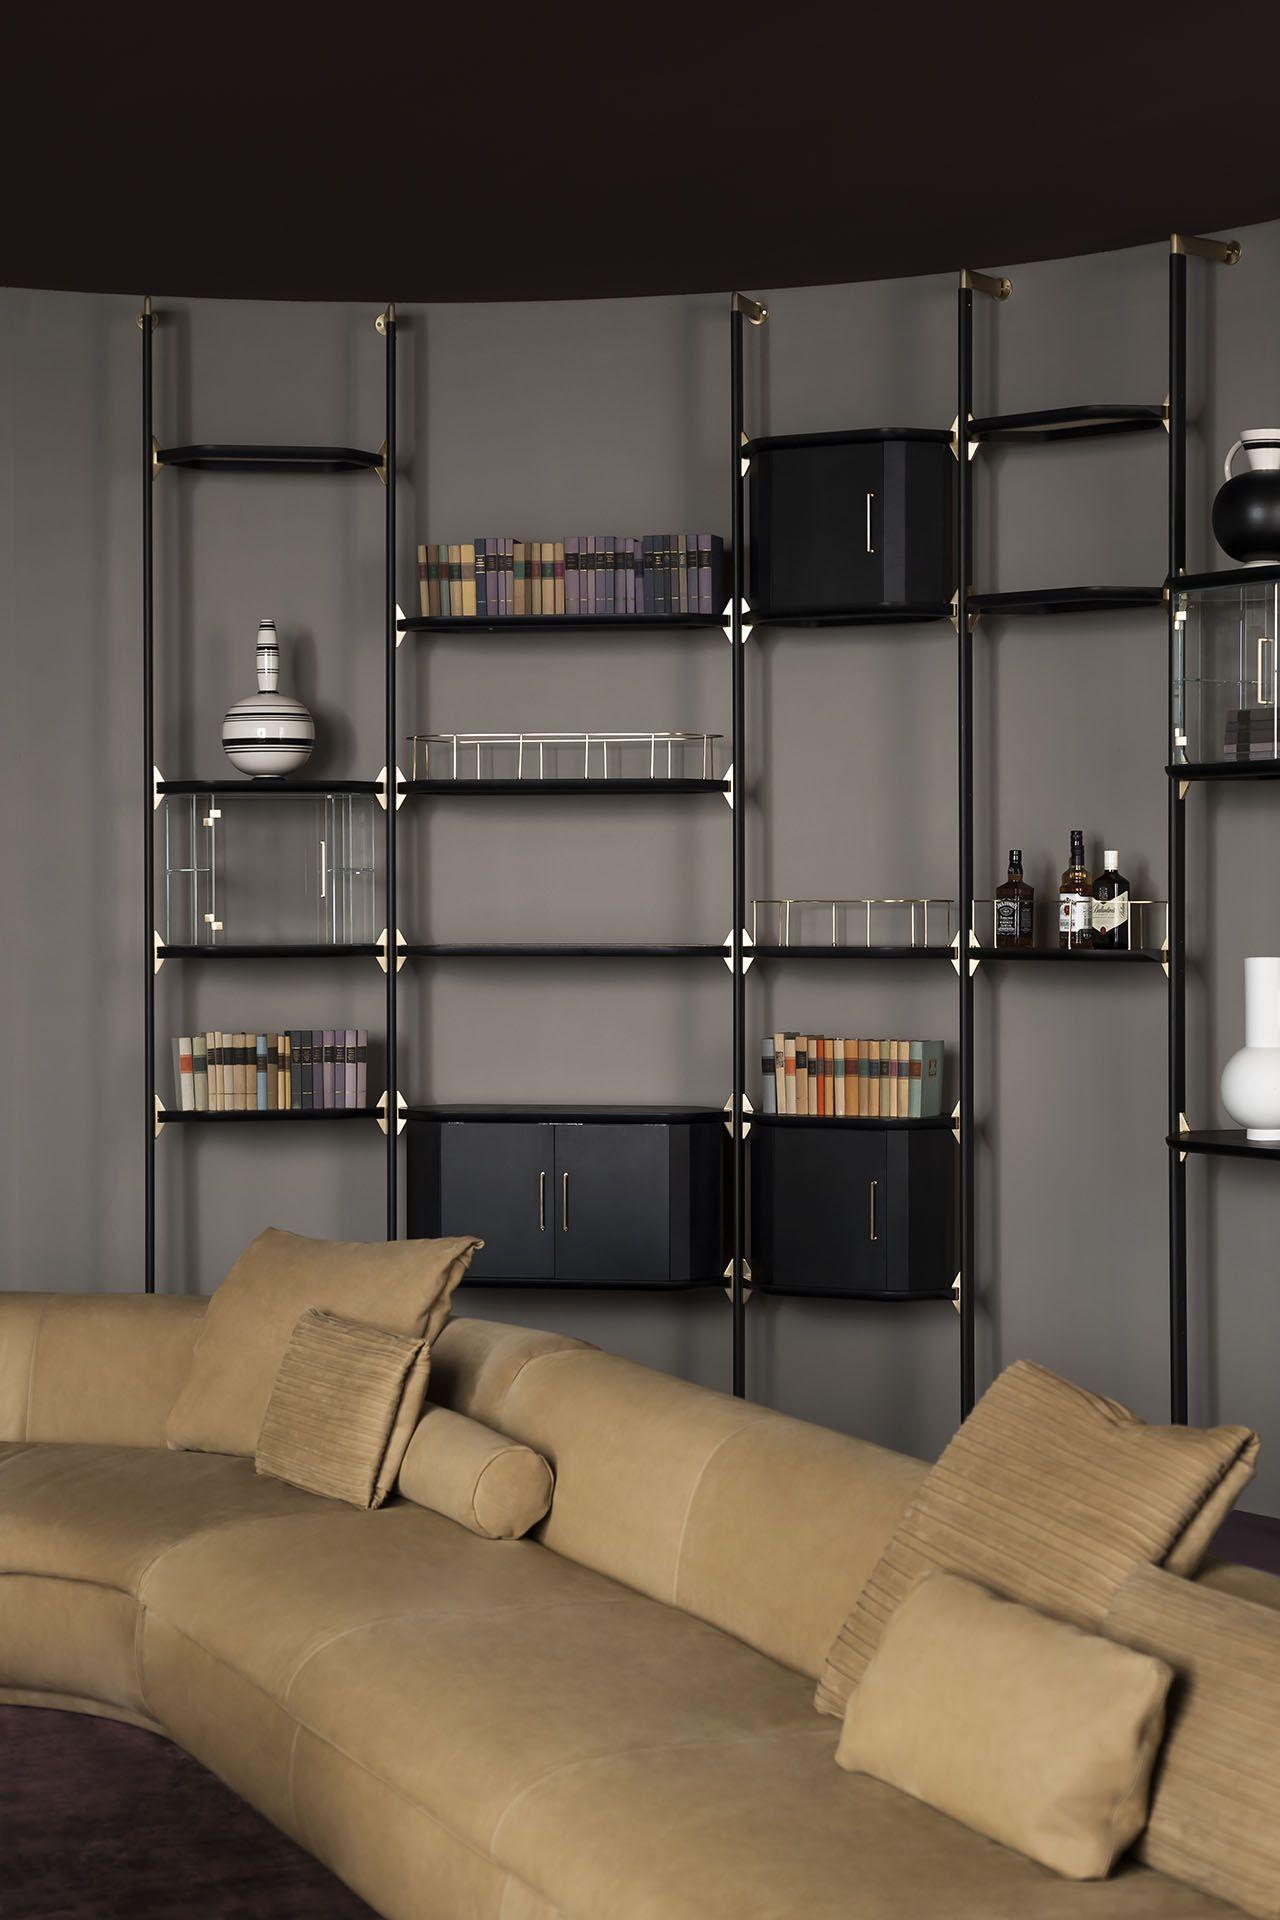 Luxury Showcase For Living Room Royal Art Deco: LIBRERIA LIBELLE